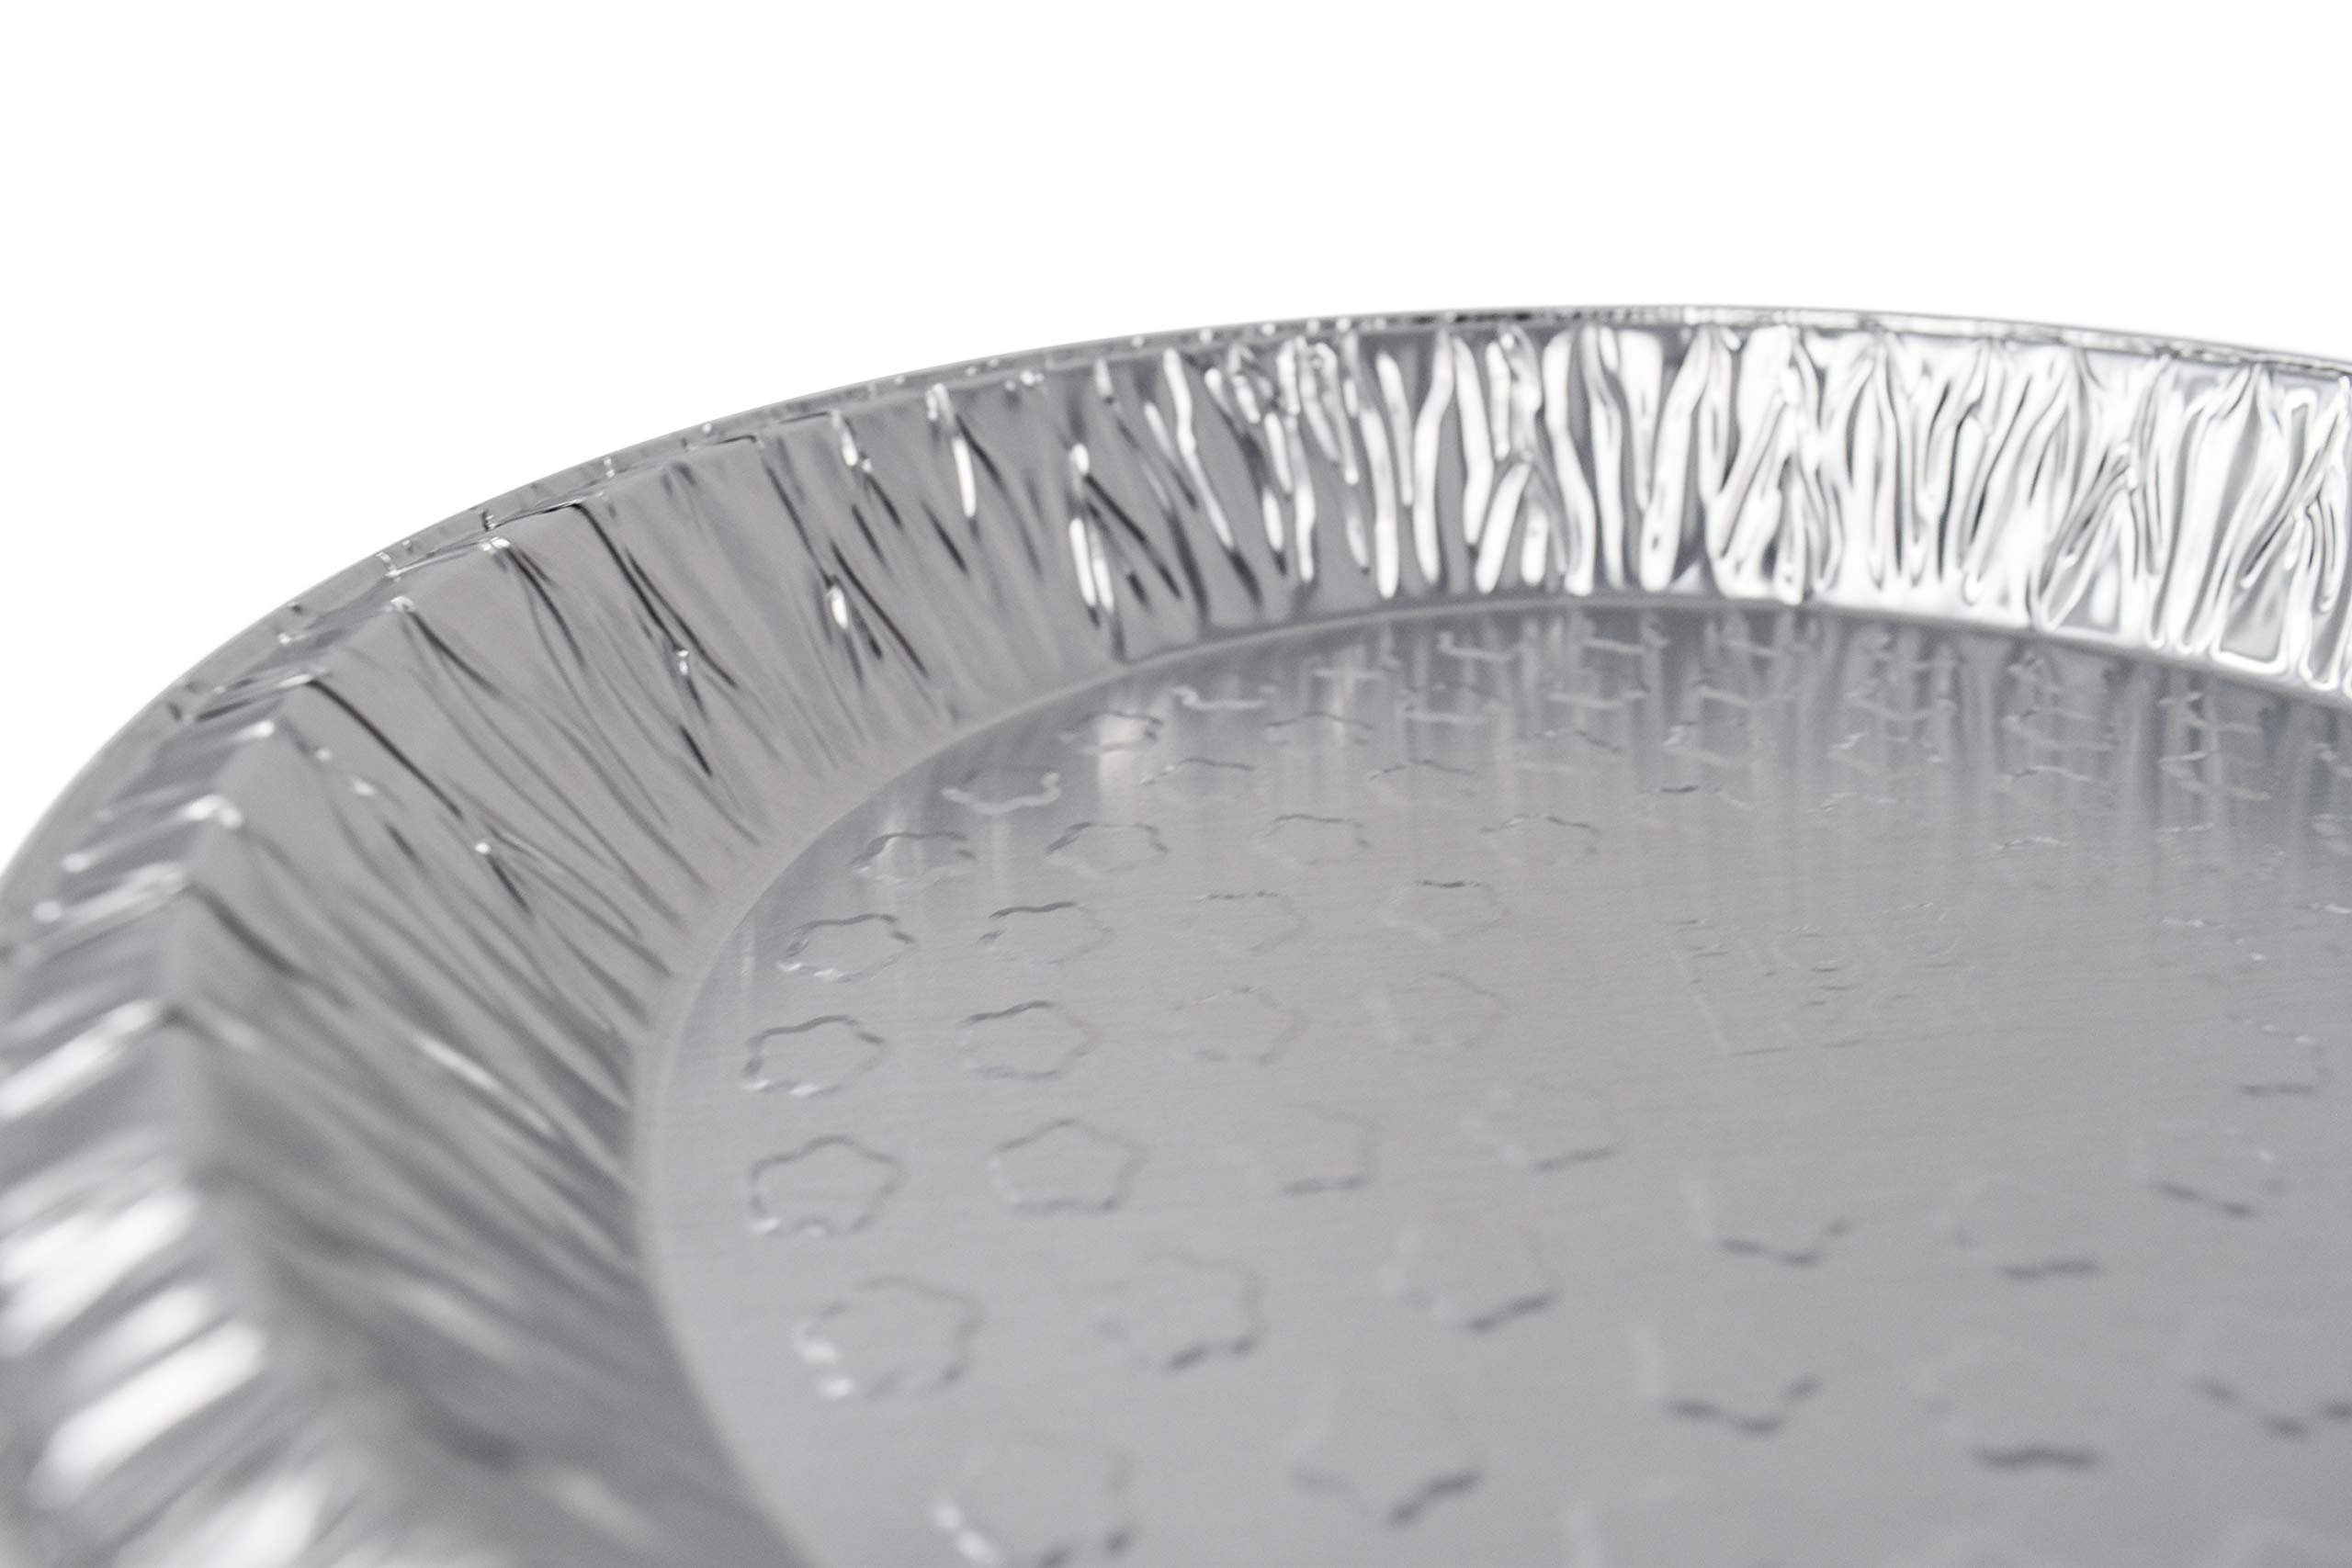 Fig & Leaf (120 Pack) Premium 9-Inch Pie Pans l 36 Gauge l Disposable Tart Pan Tin Plates Aluminum Foil for Baking Quiche by Fig & Leaf (Image #3)